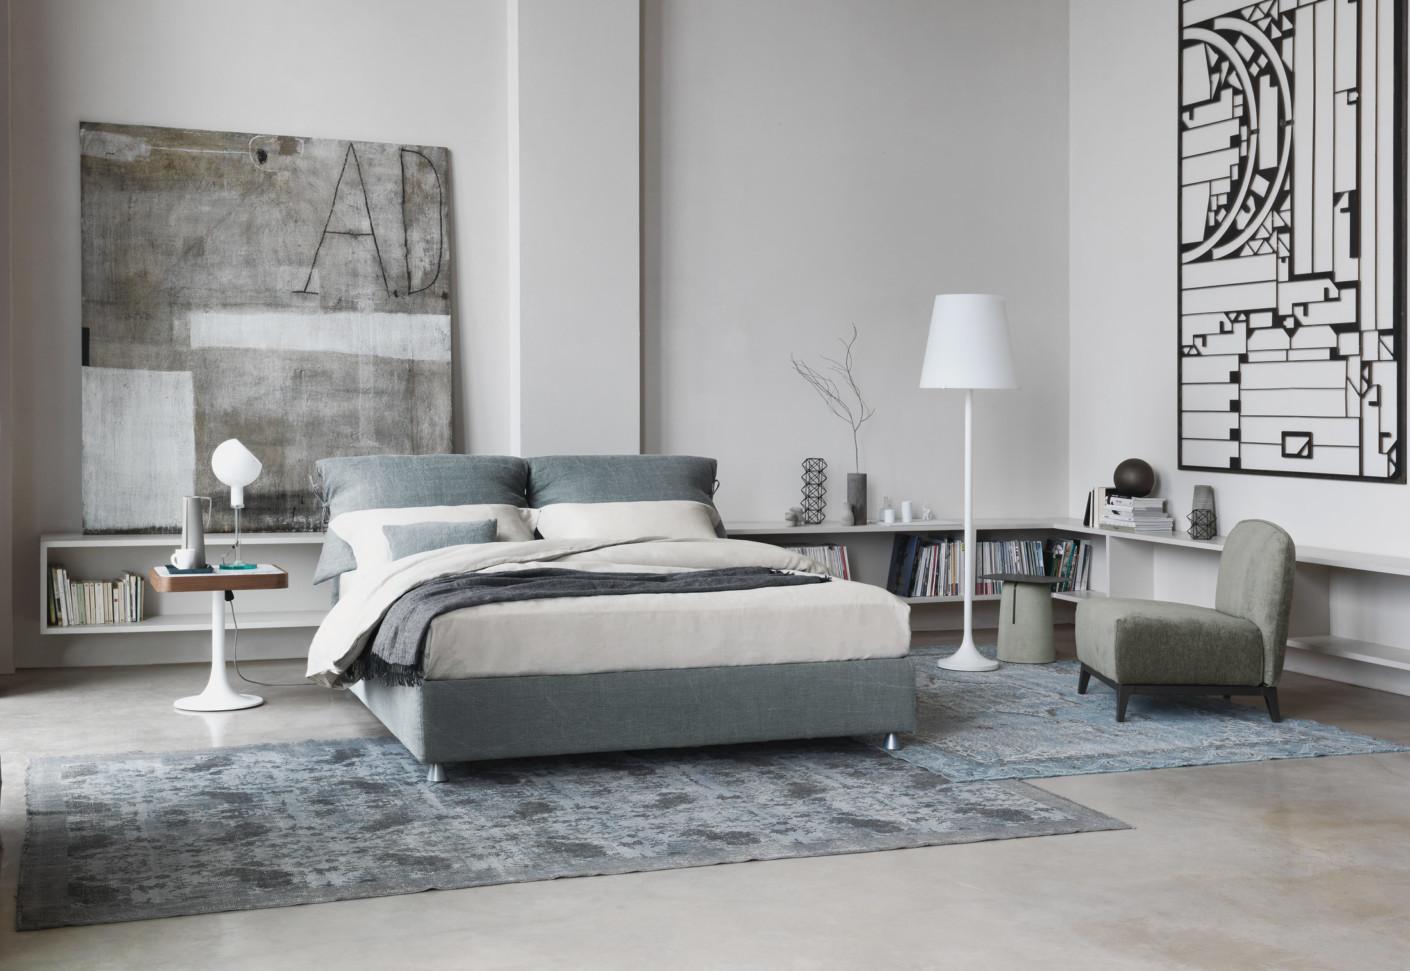 nathalie double bed by flou stylepark. Black Bedroom Furniture Sets. Home Design Ideas